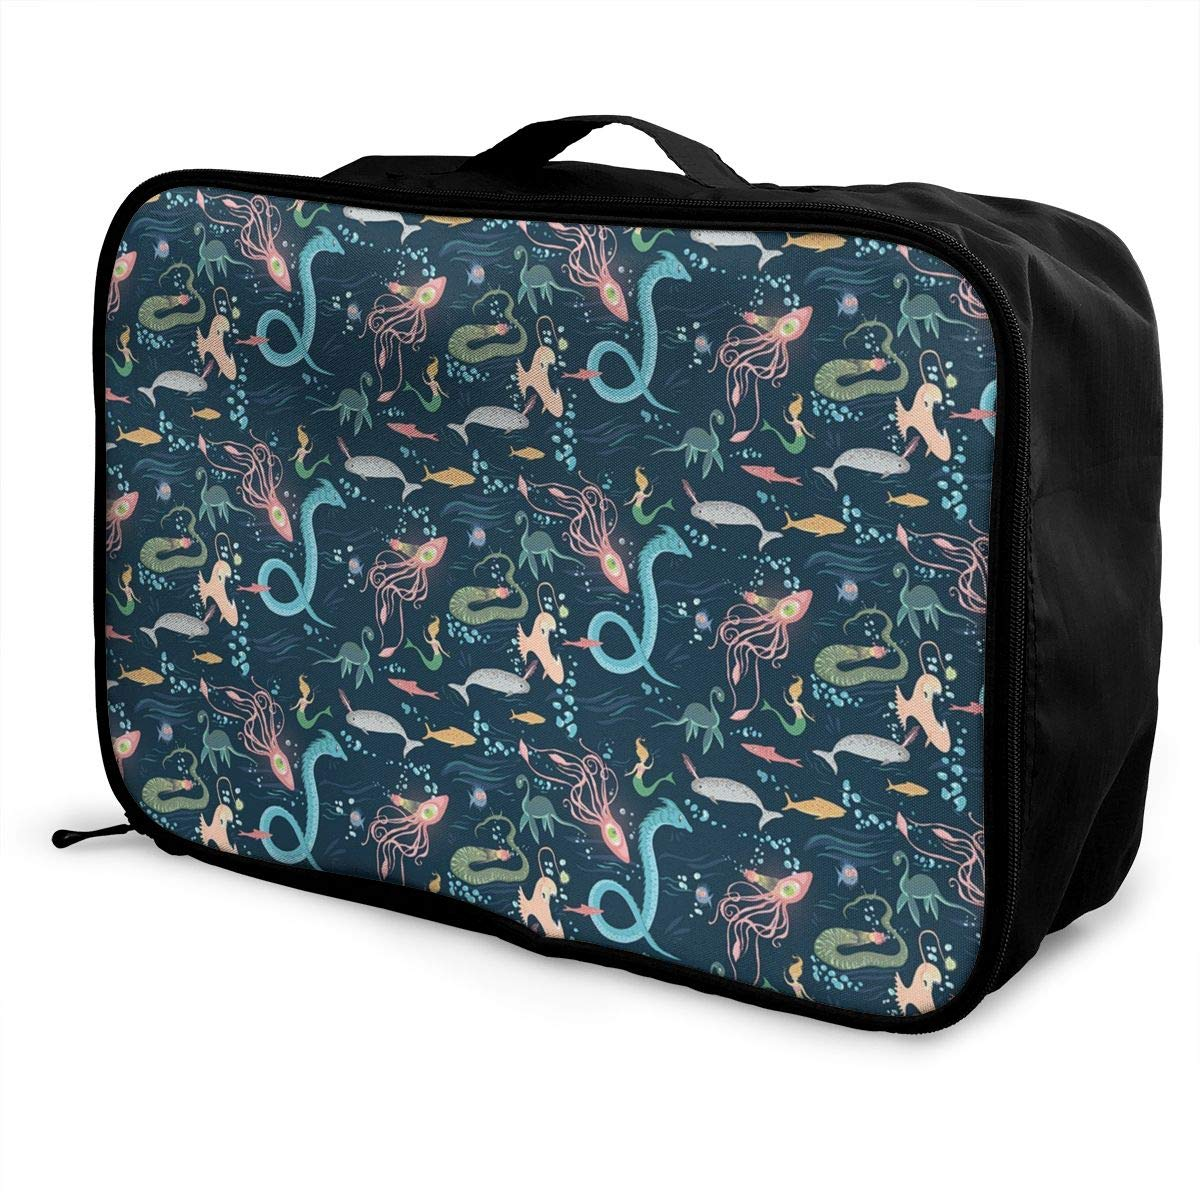 Mermaid Octopus Fish Travel Duffel Bag Casual Large Capacity Portable Luggage Bag Suitcase Storage Bag Luggage Packing Tote Bag Weekend Trip